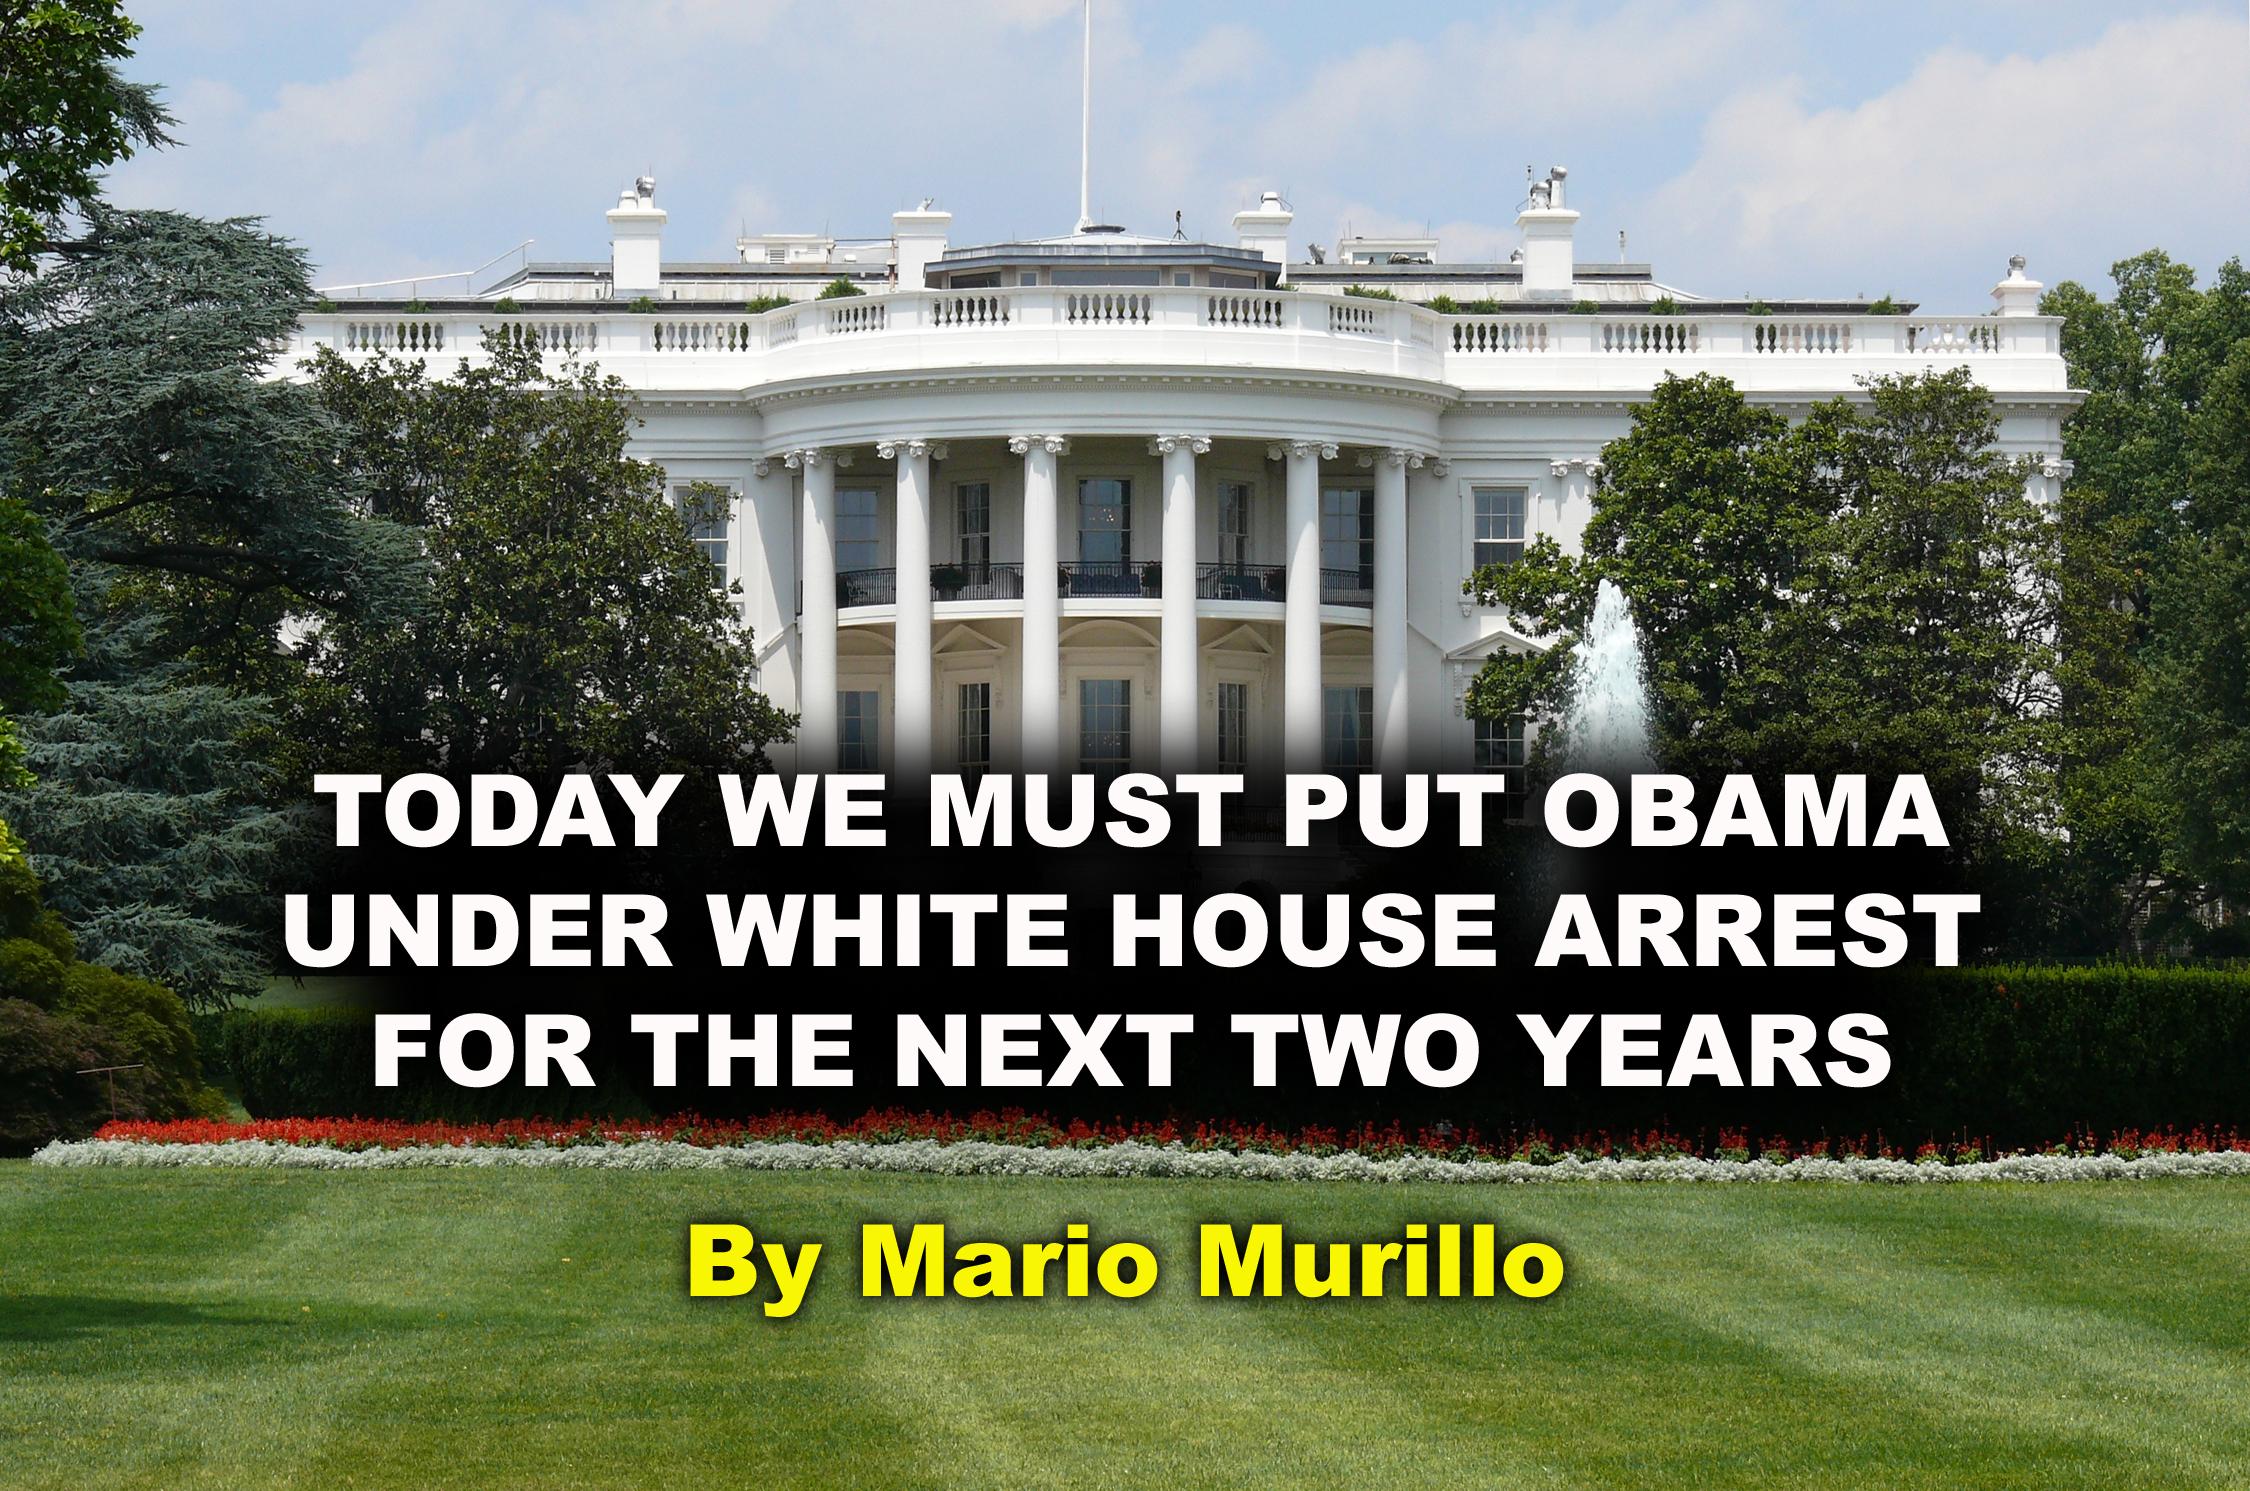 White-House Arrest